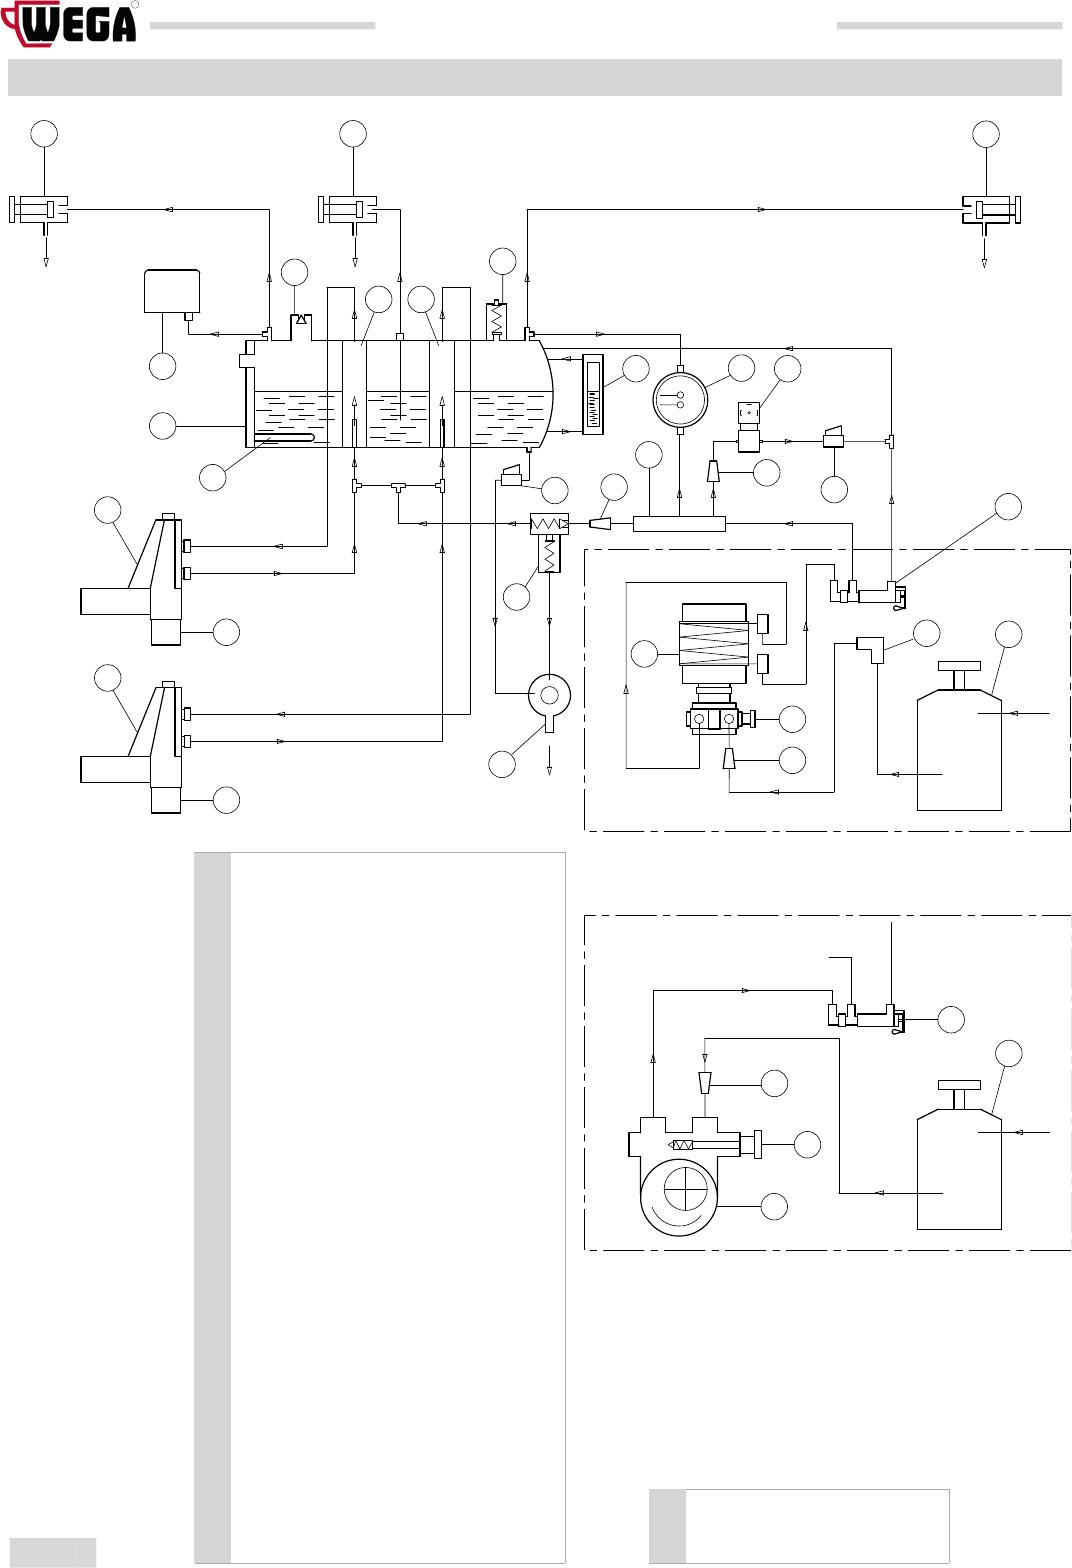 Man Tecnico Wega Rev03 05 2005 Technical Manual Traditional 14 Espresso Machine Diagram Coffee Hydraulic Diagrams